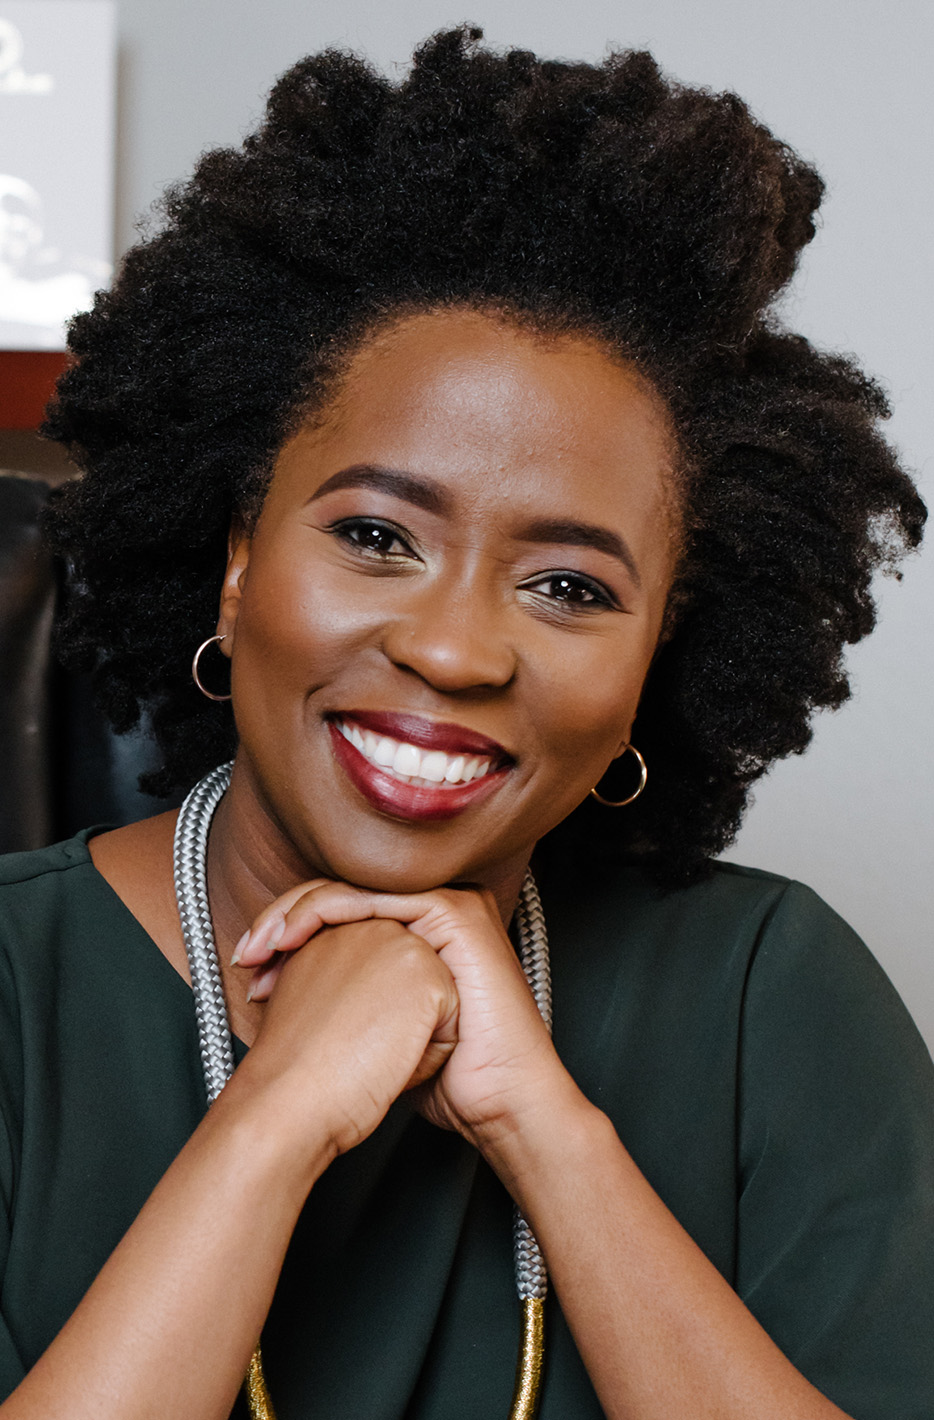 Vuyiswa Mutshekwane, CEO